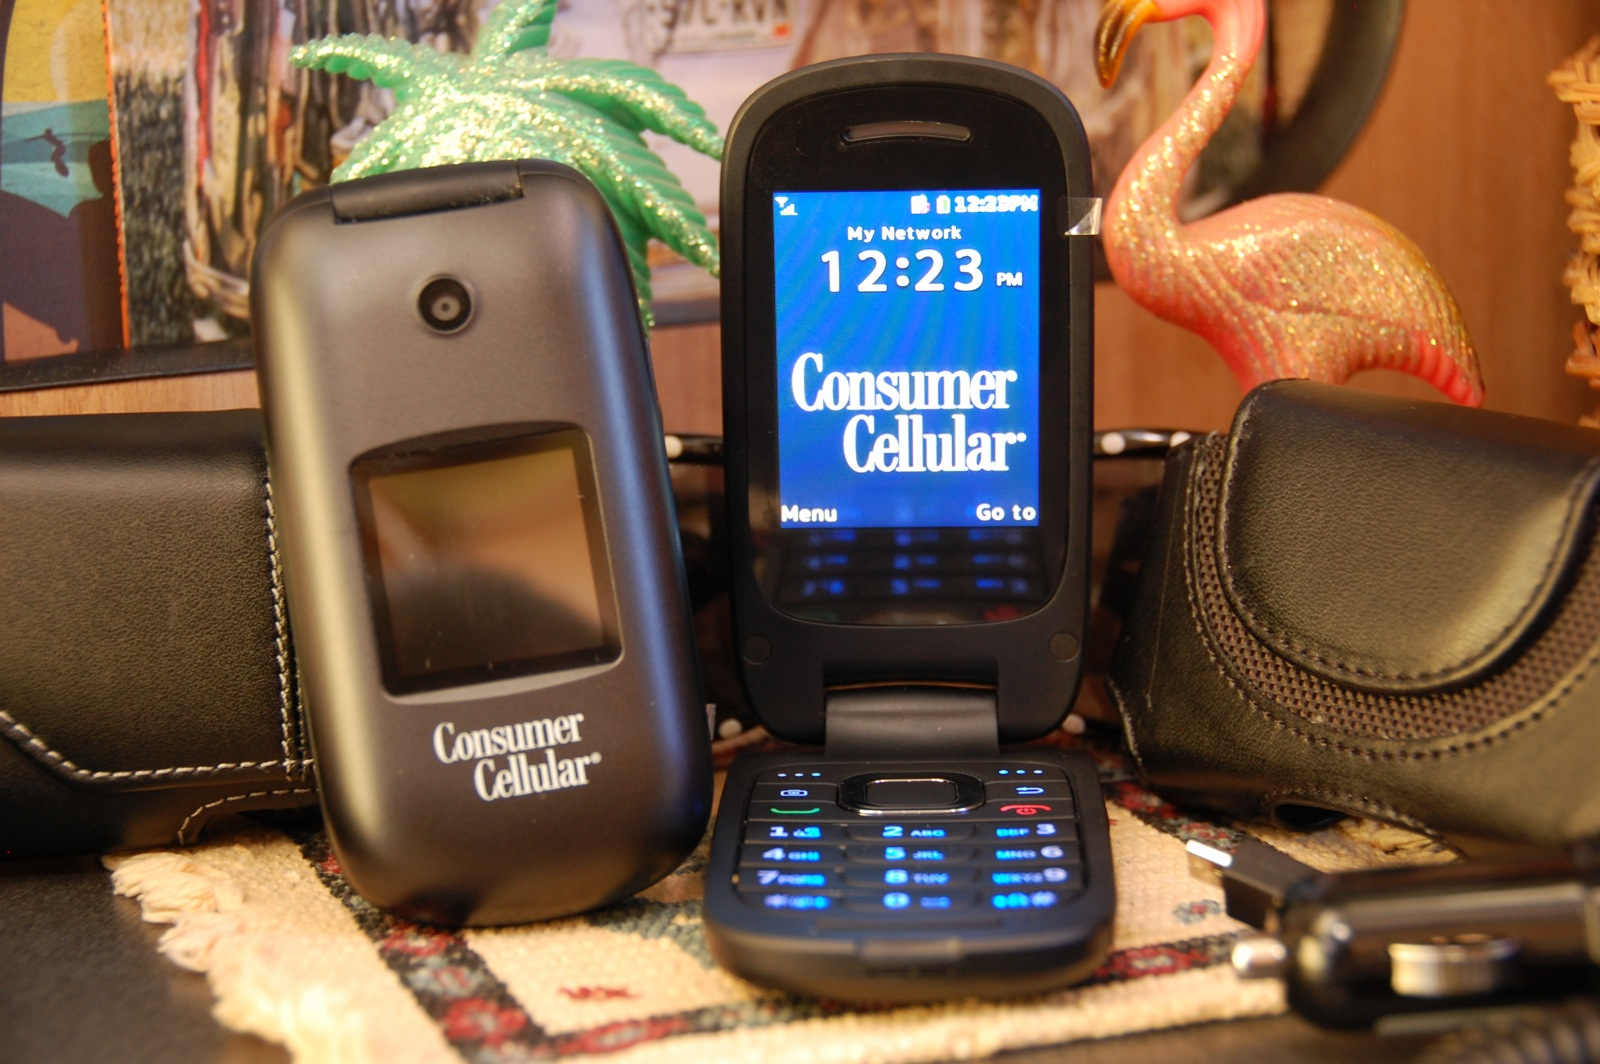 Click image for larger version  Name:DSC_0106 Consumer Cellular Envoy.jpg Views:298 Size:394.4 KB ID:222878